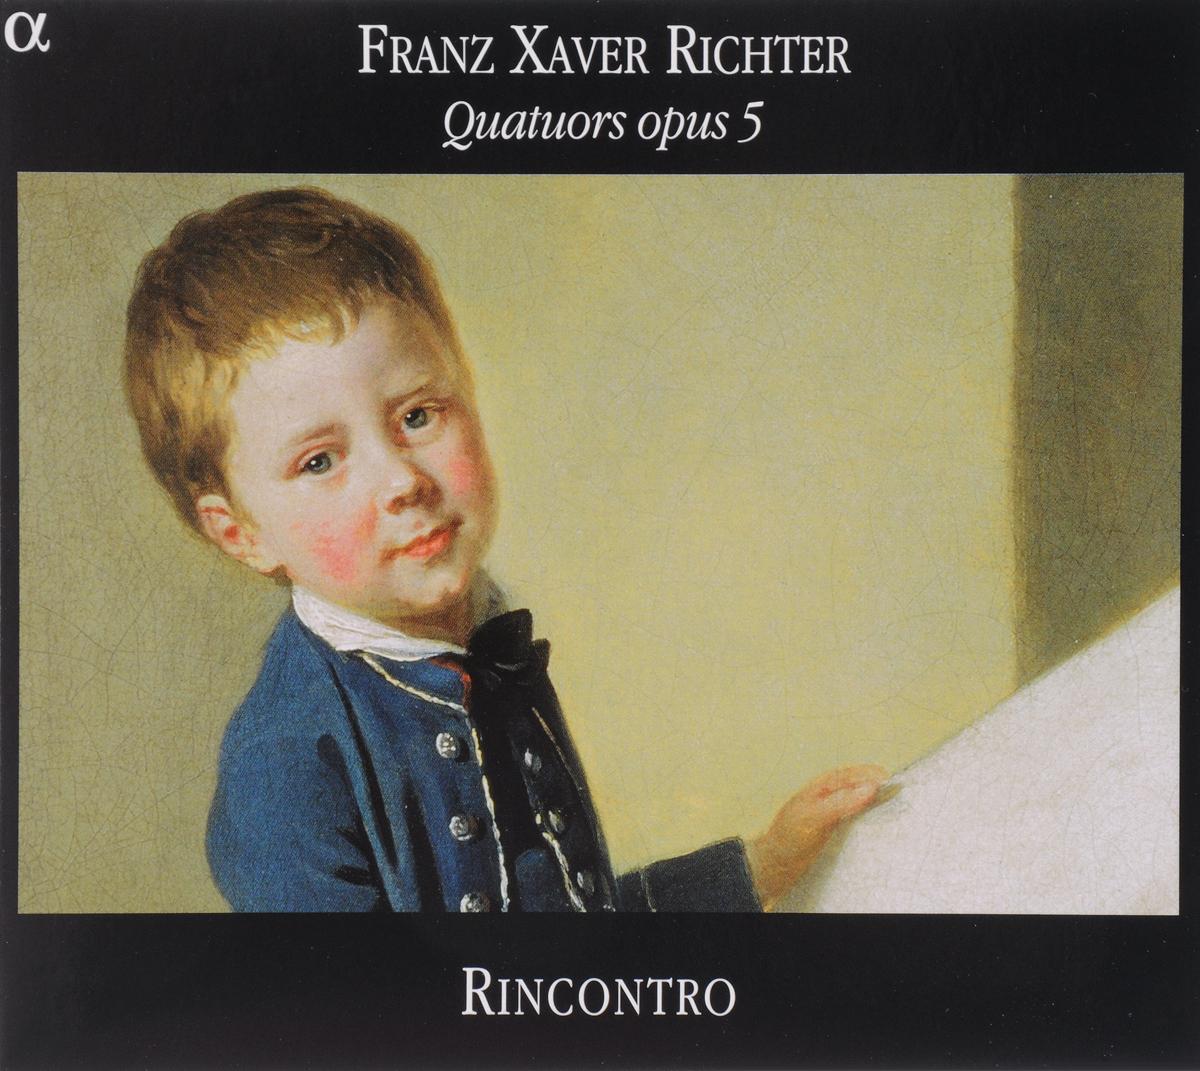 VARIOUS. RICHTER, FRANZ XAVER (1709-1789)/QUARTETS NOS 1-3, OP.5/MOZART : 2 FUGUES D'APRES BACH (K.405), CANON ALLA SECUNDA (K.562C) /RINCONTRO QUARTET (PABLO VALETTI, VIOLIN; AMANDINE BEYER, VIOLIN; PATRICIA GAGNON, VIOLA; PETR SKALKA, CELLO). 1 richter 12224255111 28